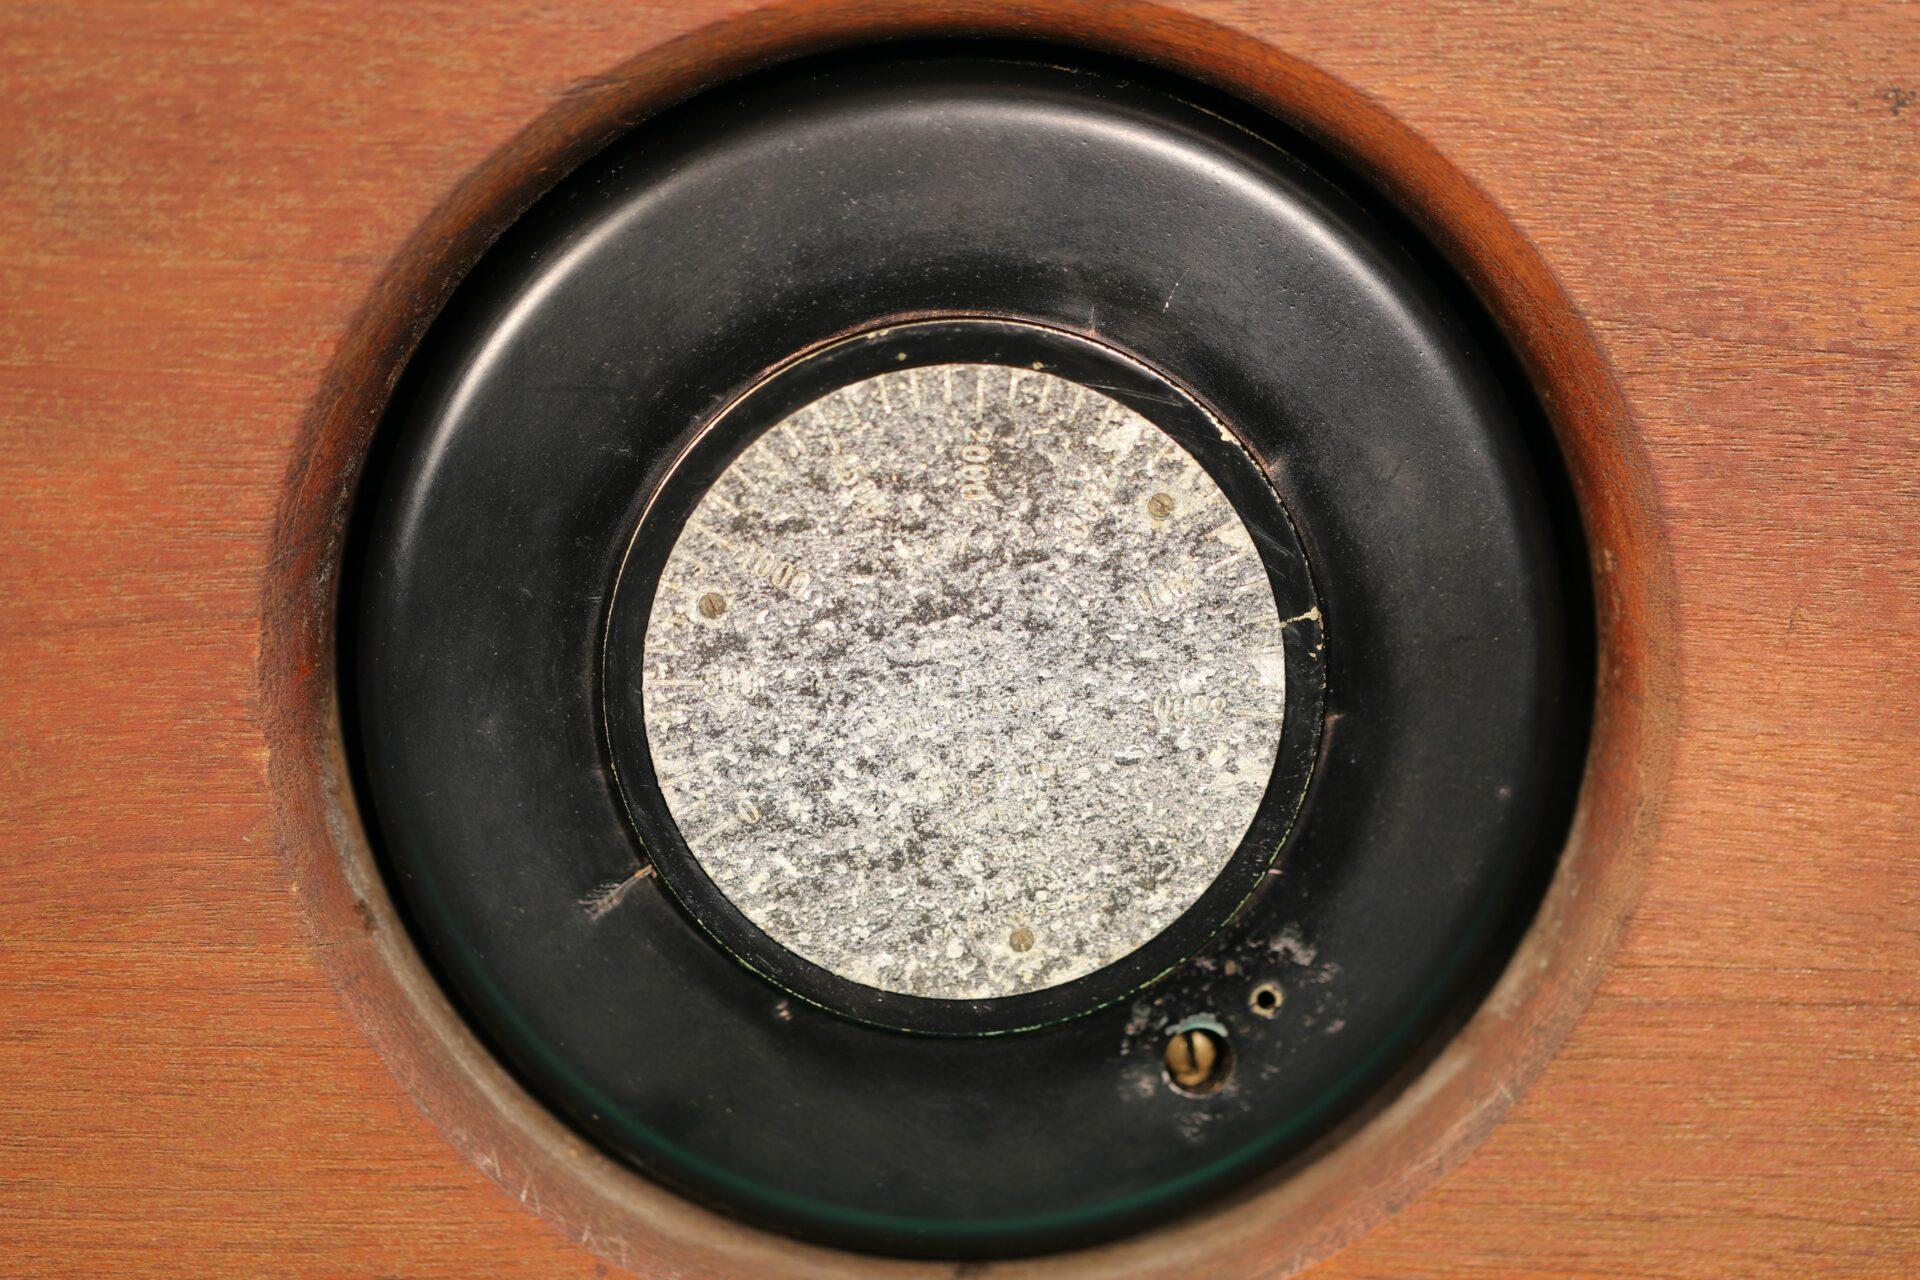 Image of altitude correction disc for Short & Mason Hexagonal Stormoguide Barometer c1935